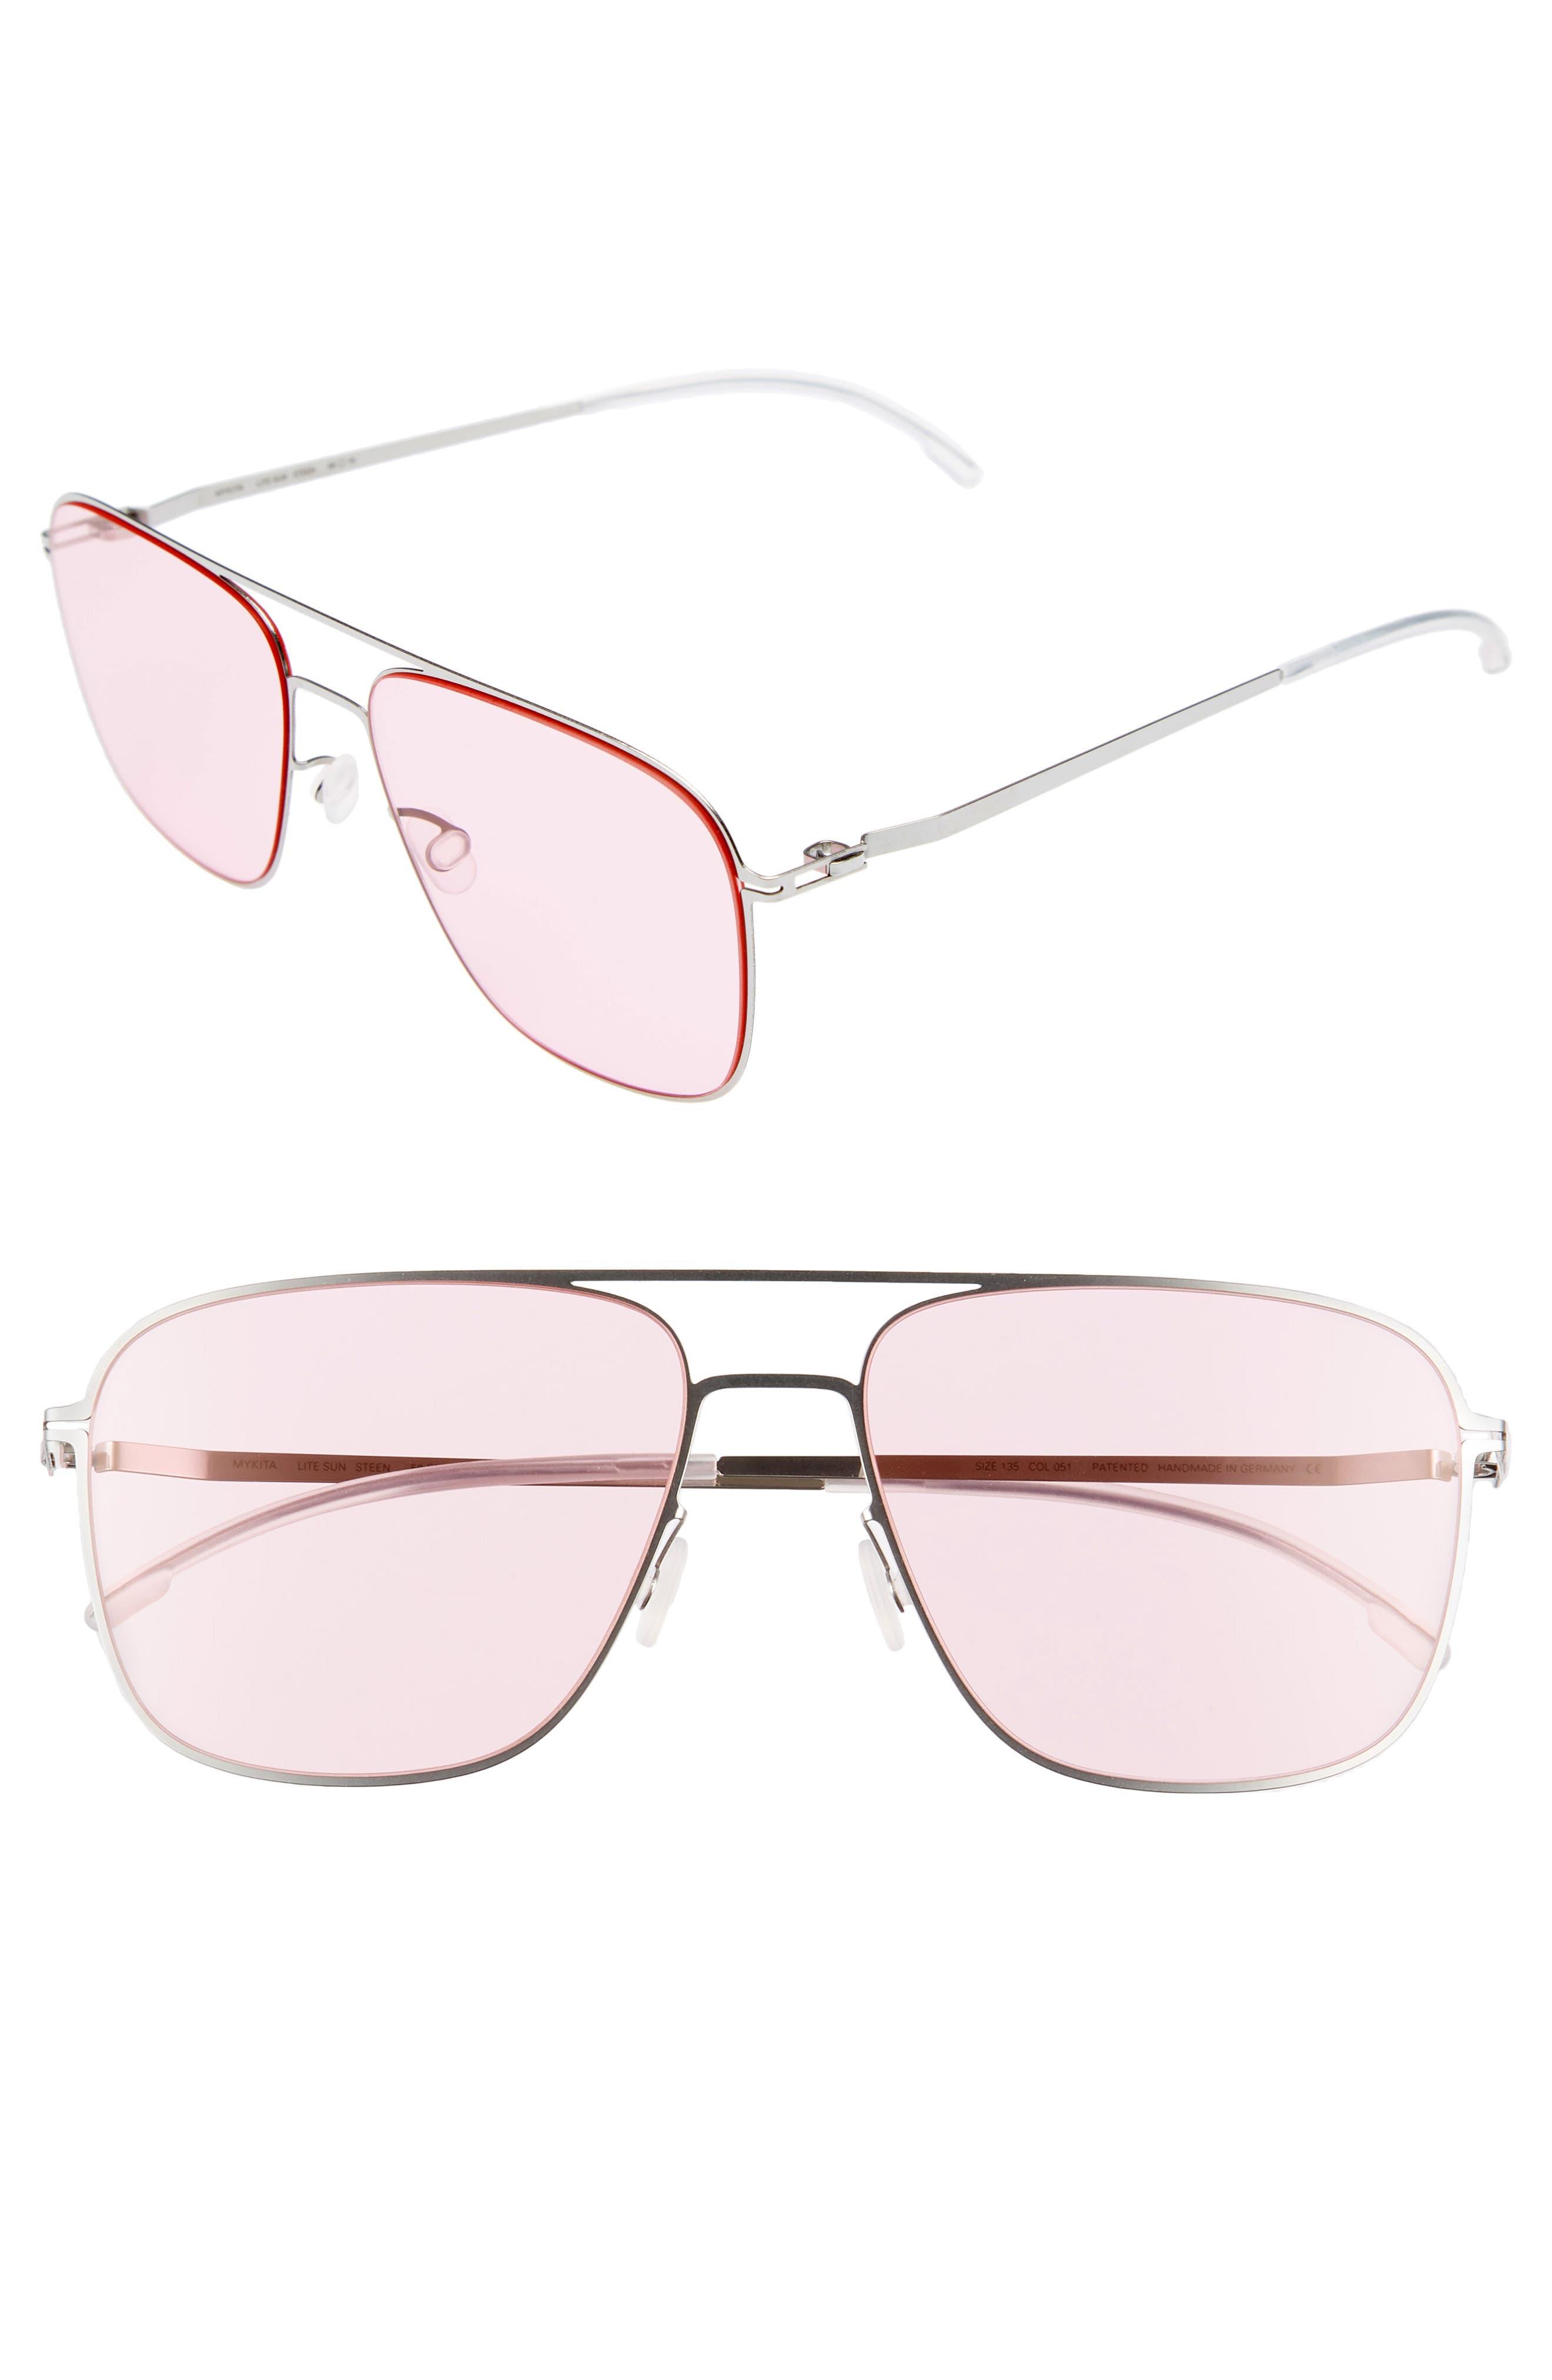 Steen 56mm Aviator Sunglasses,                             Main thumbnail 1, color,                             Shiny Silver